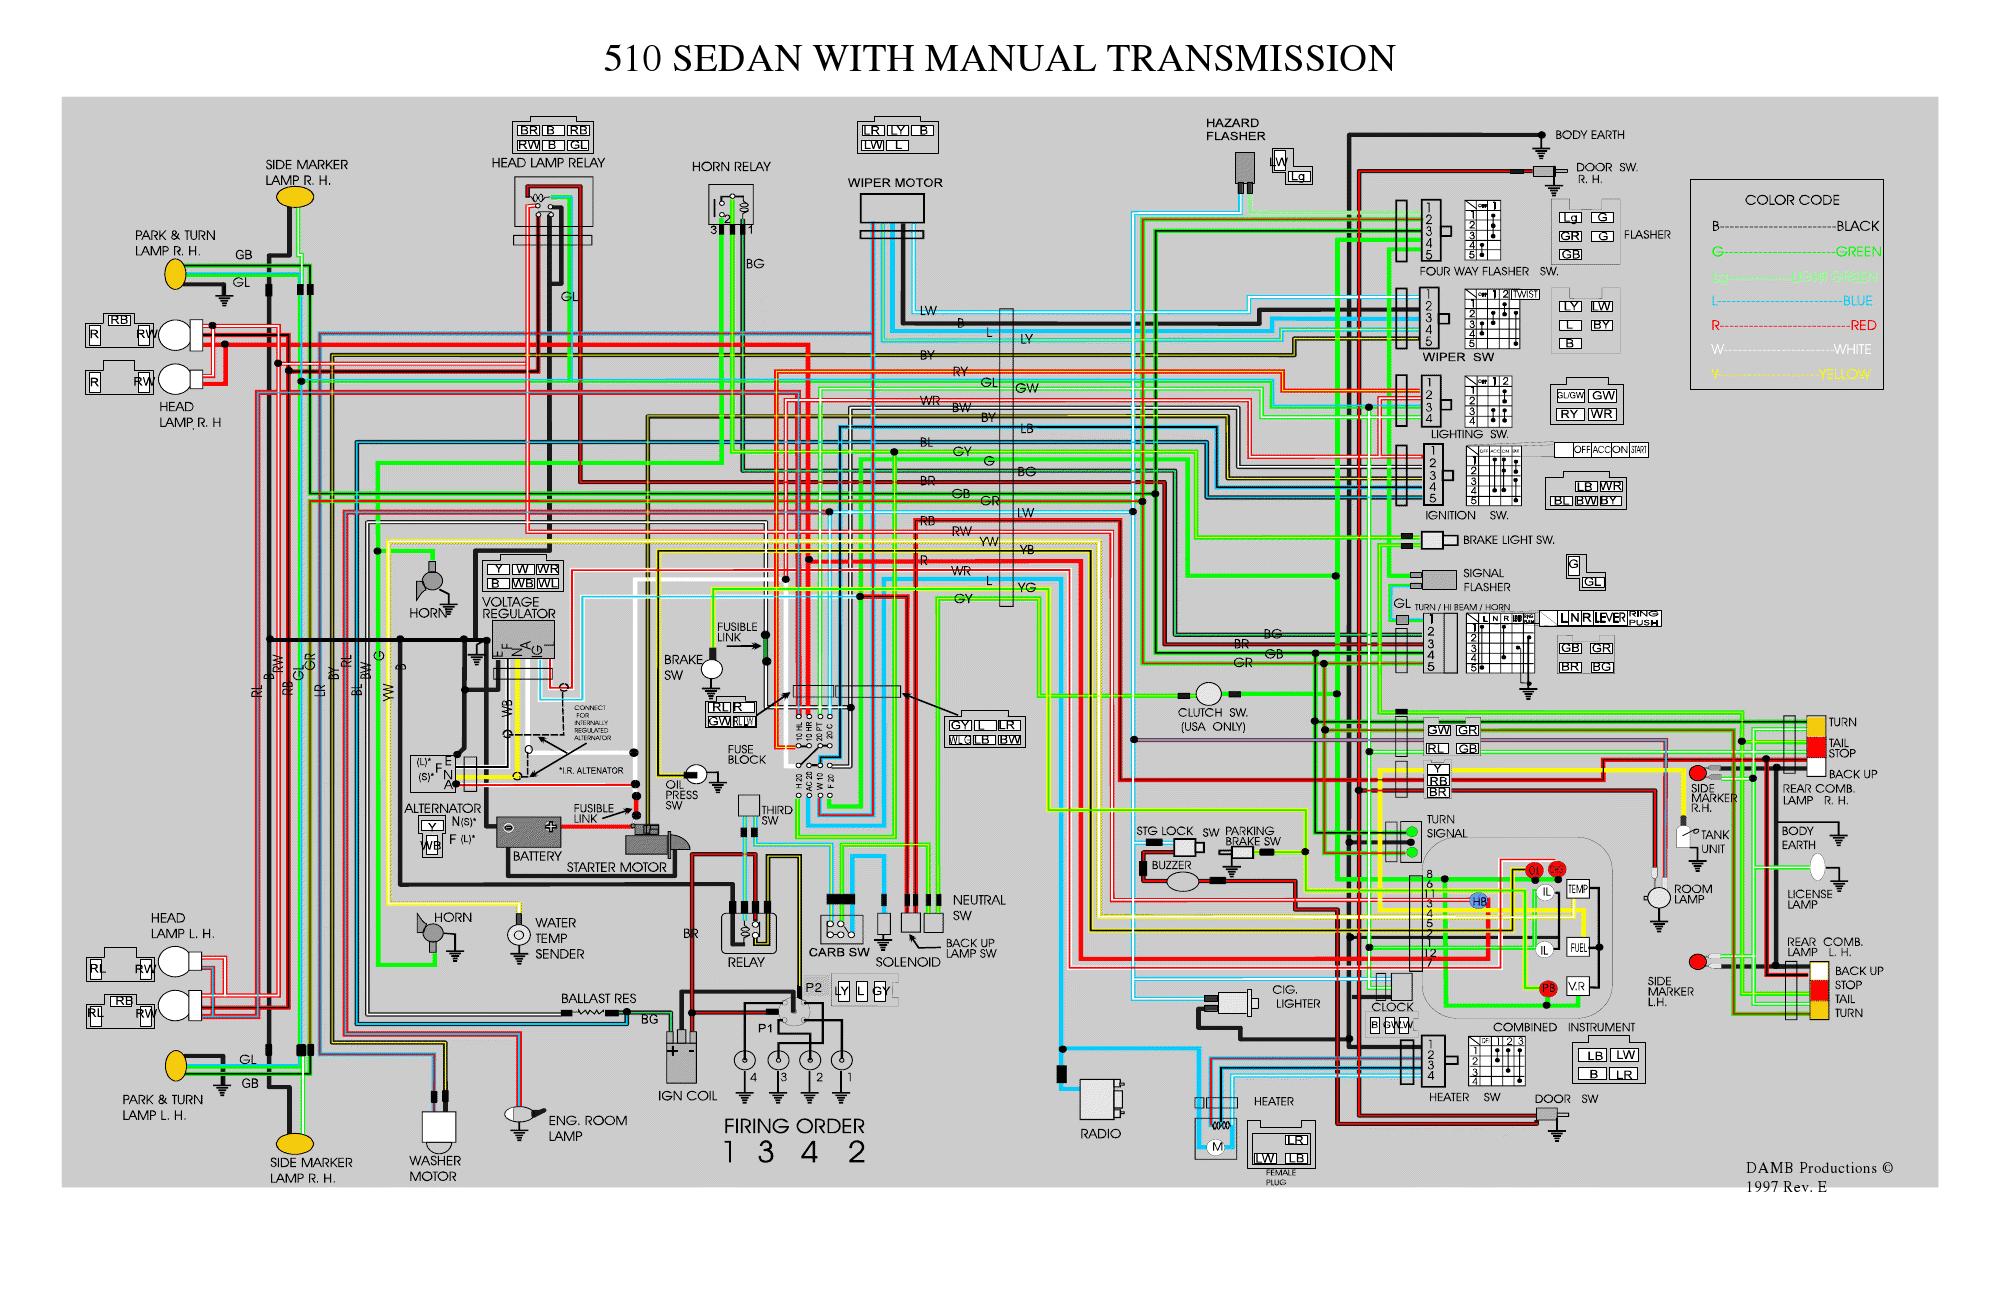 datsun_510_wiring_diagram?resize\\\\\\\\\\\\\\\=665%2C430 american standard gas furnace wiring diagram model tvs120,standard  at eliteediting.co